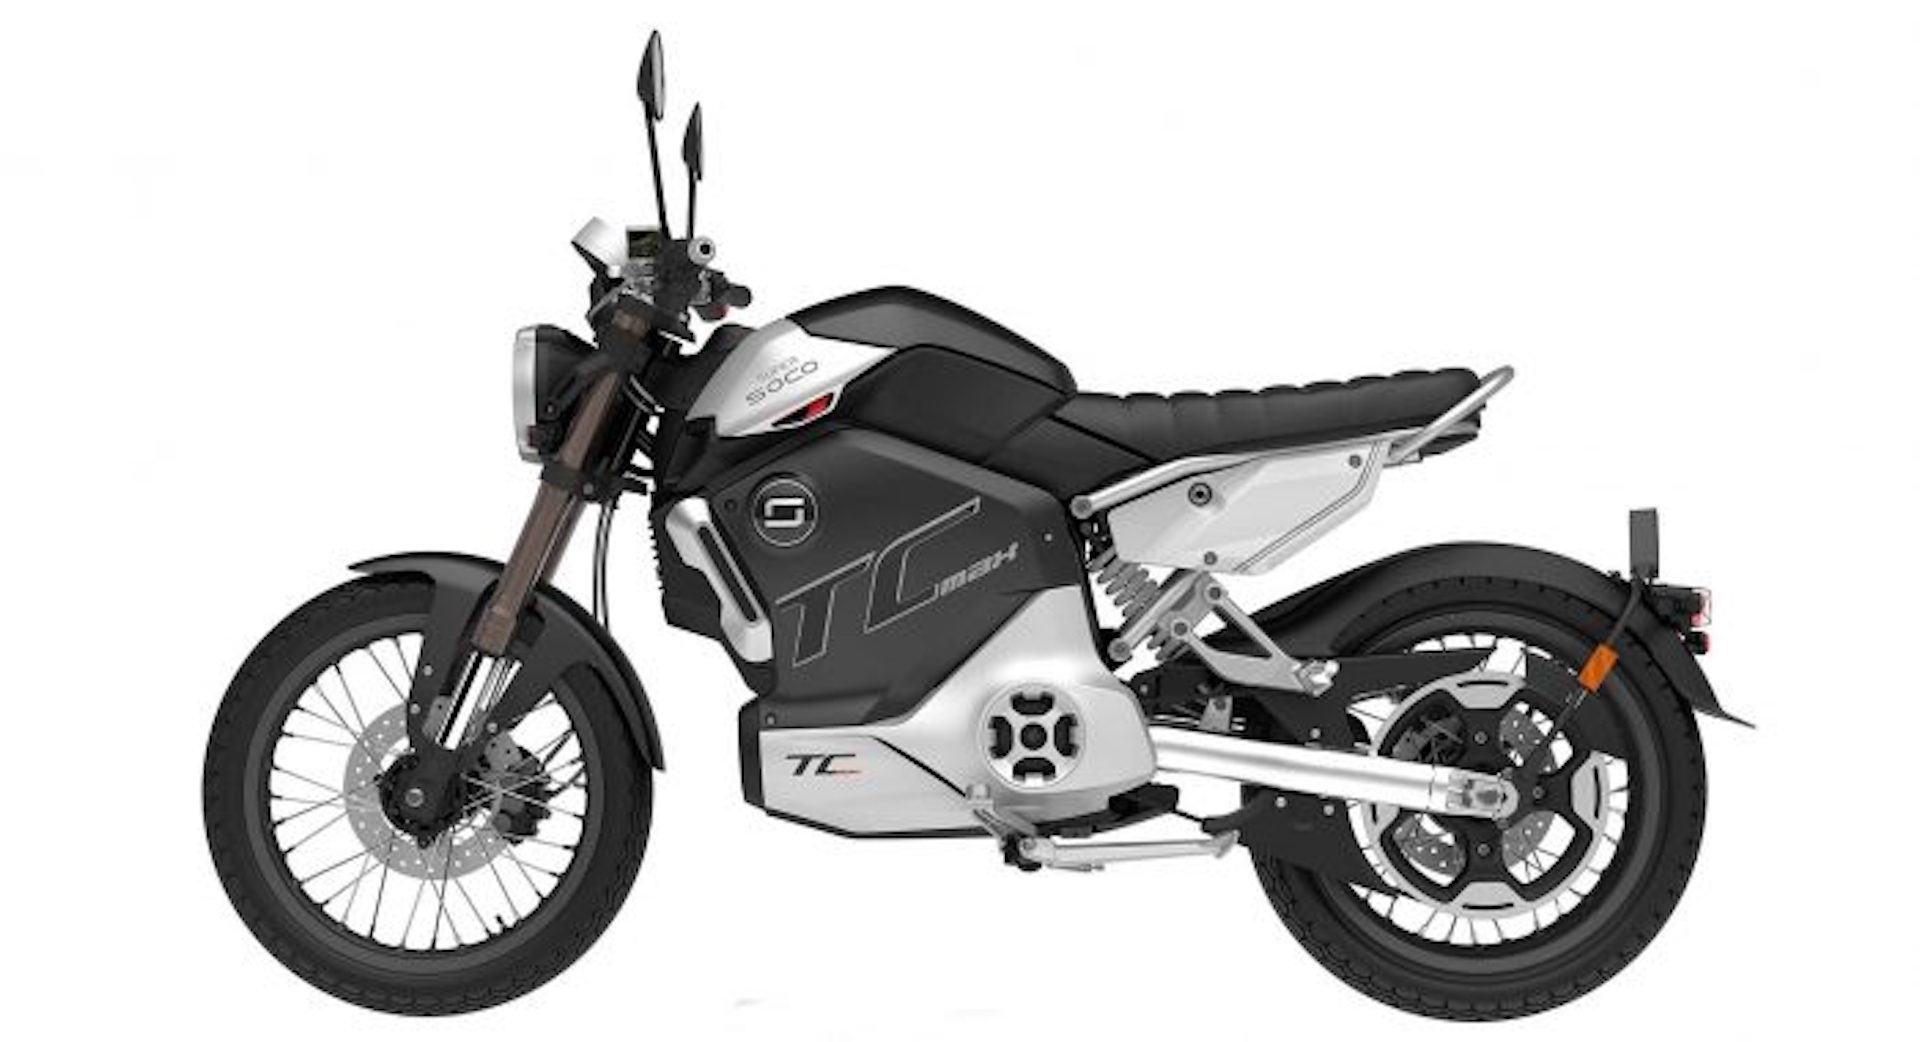 Moto Super Soco Tc Max 5